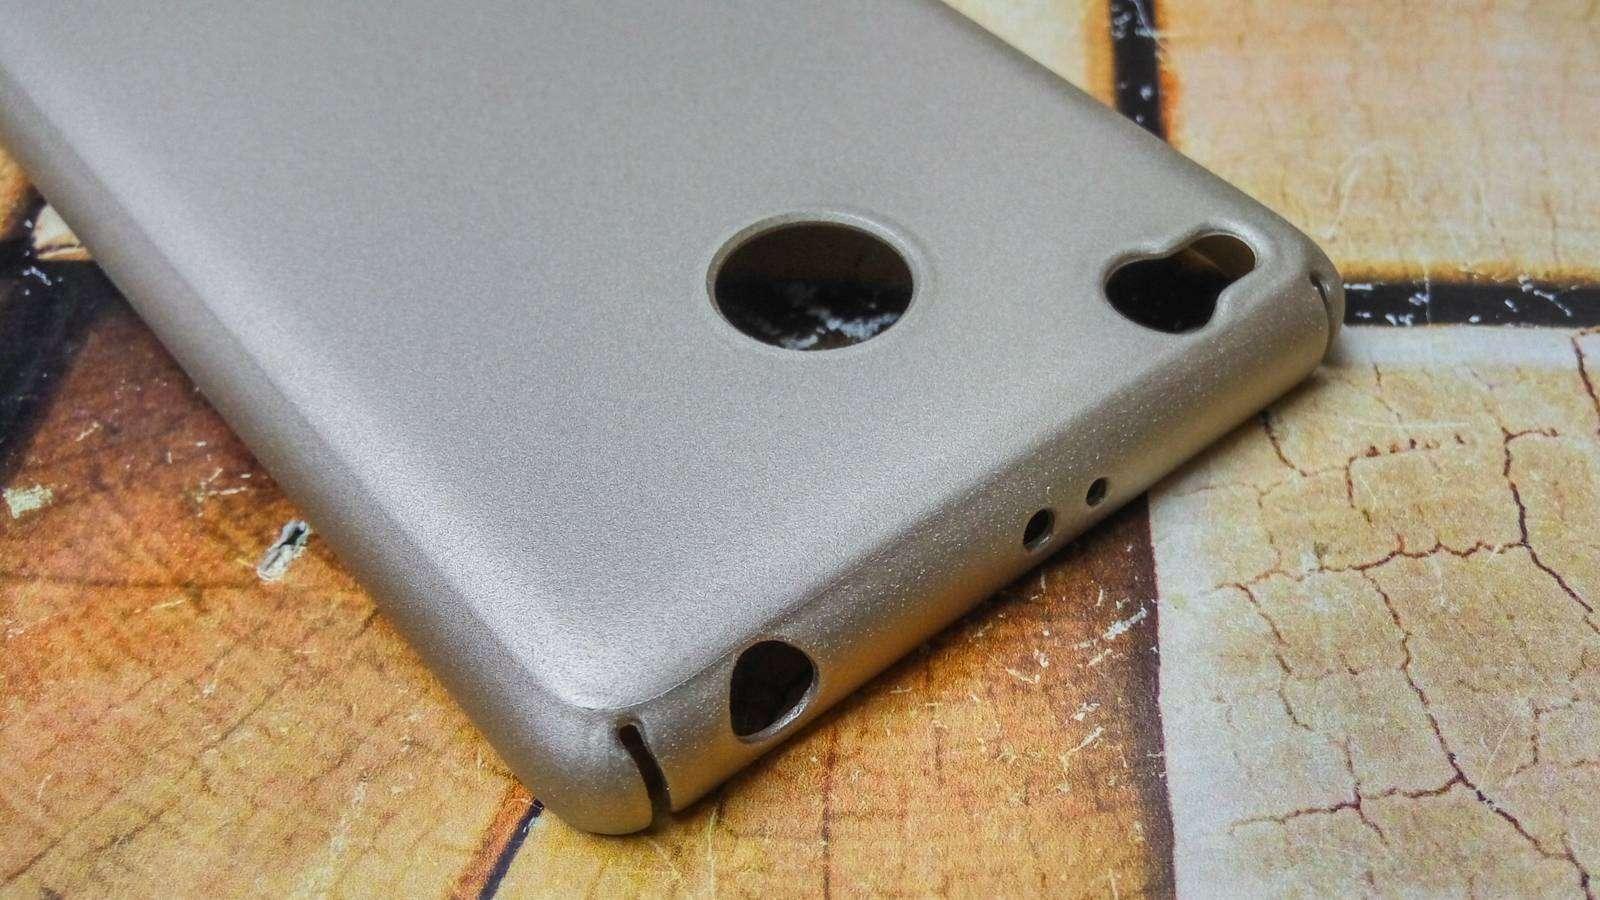 Aliexpress: Качественный пластиковый бампер MSVII Coque для Xiaomi Redmi 3 Pro, Redmi 3 S